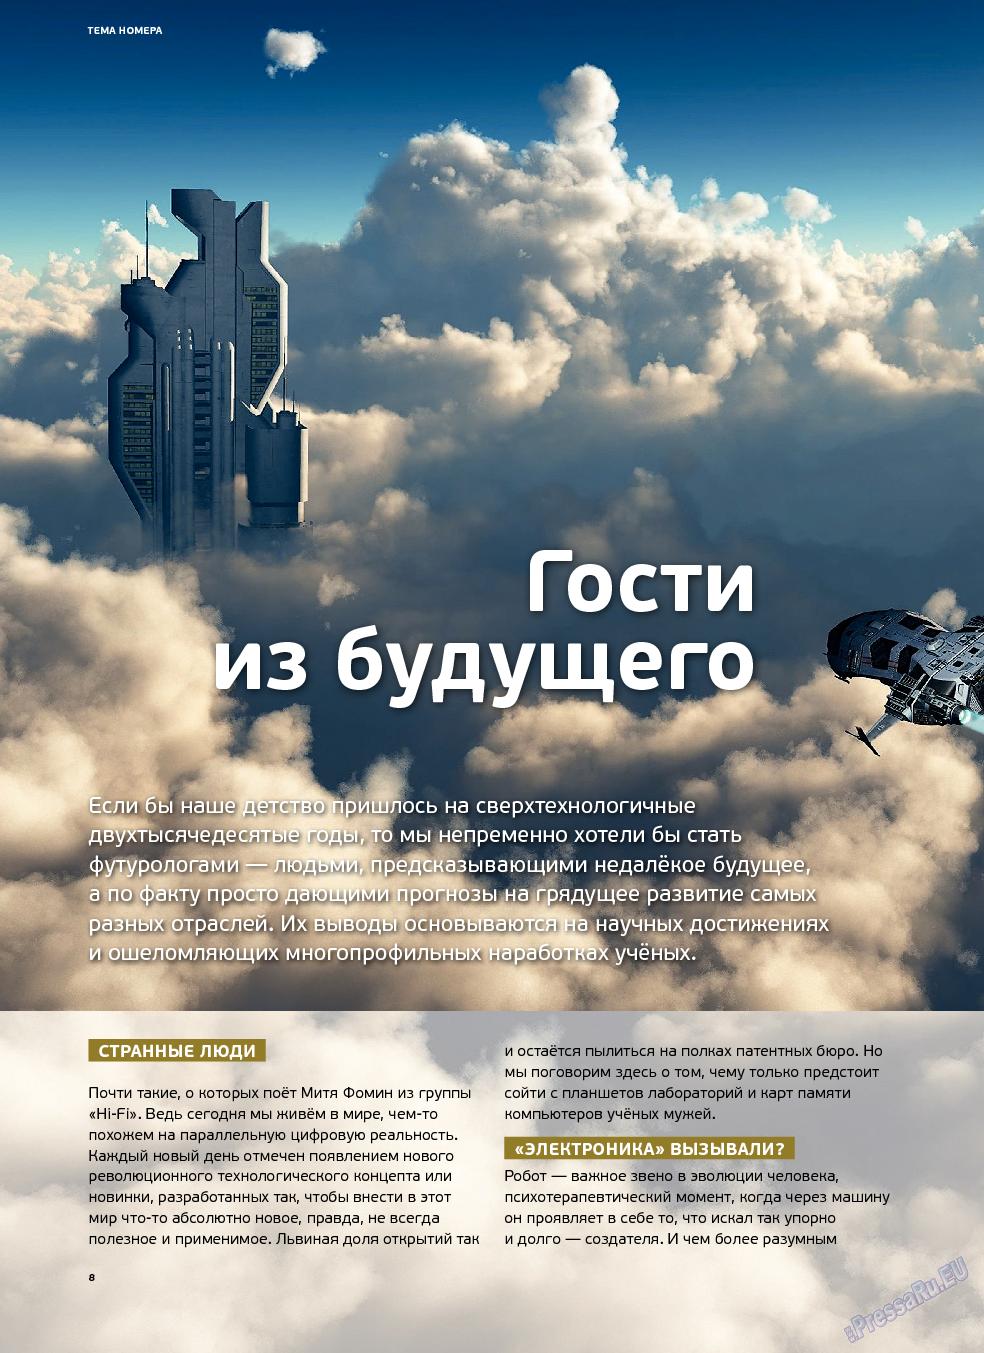 Артек (журнал). 2013 год, номер 5, стр. 10